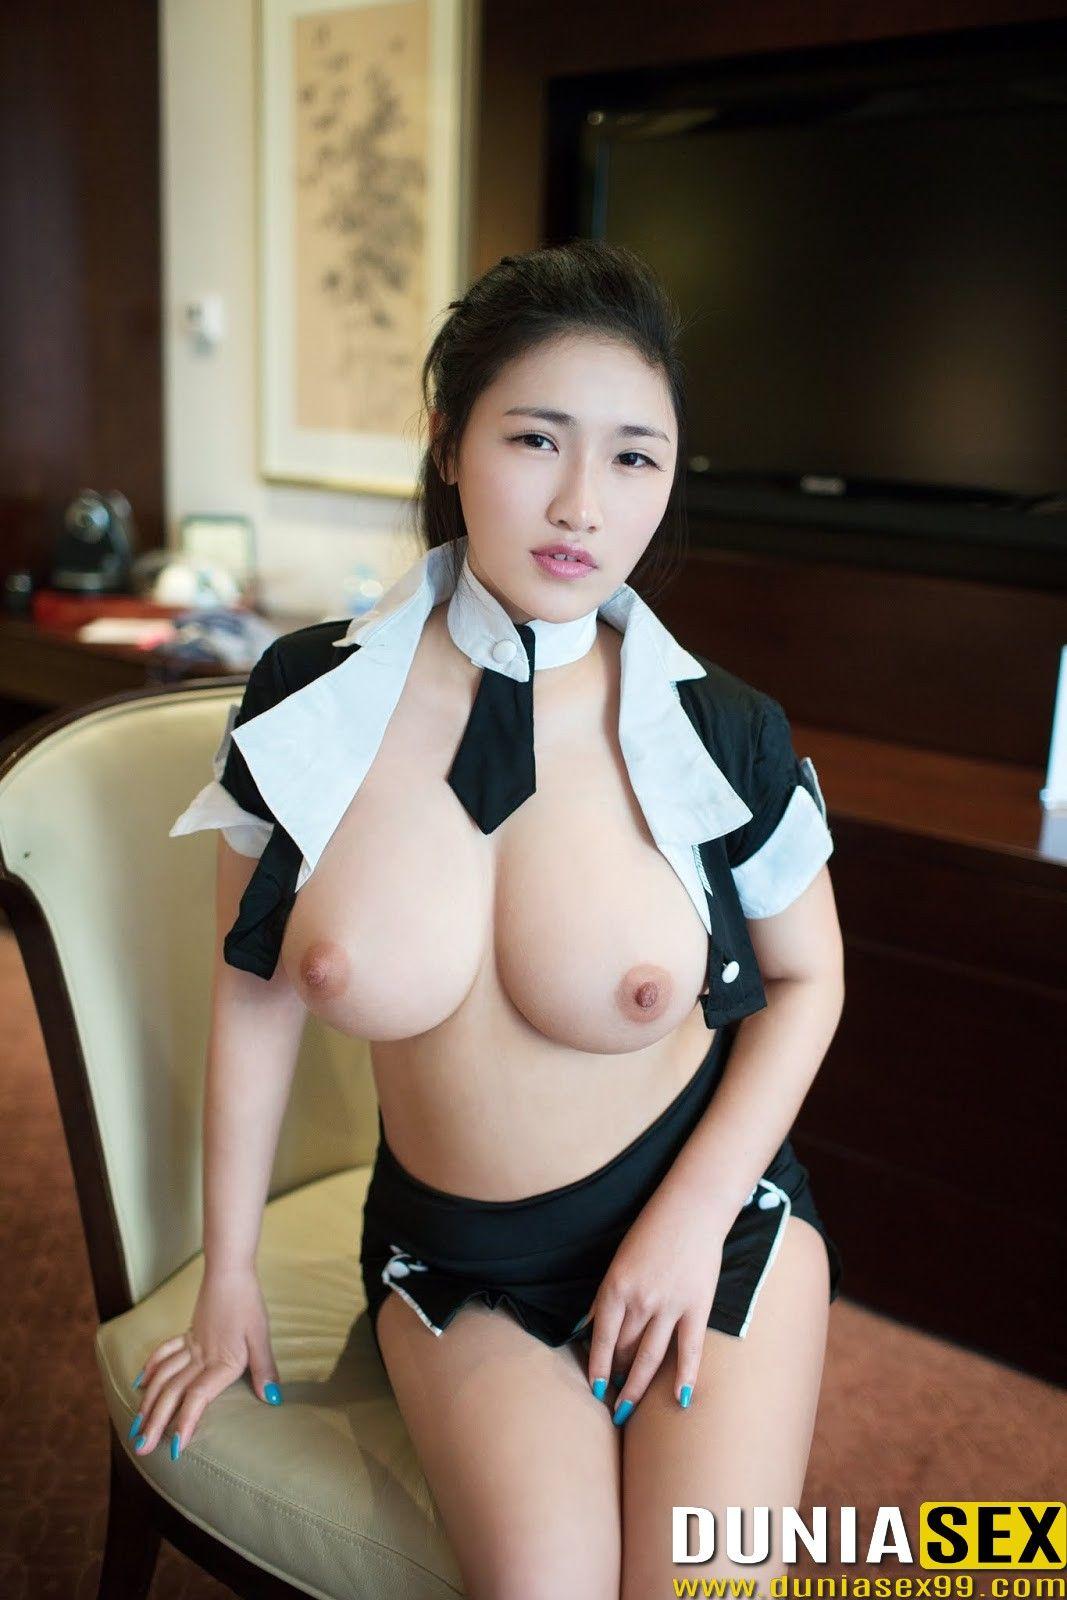 Chubby wife bottom nude